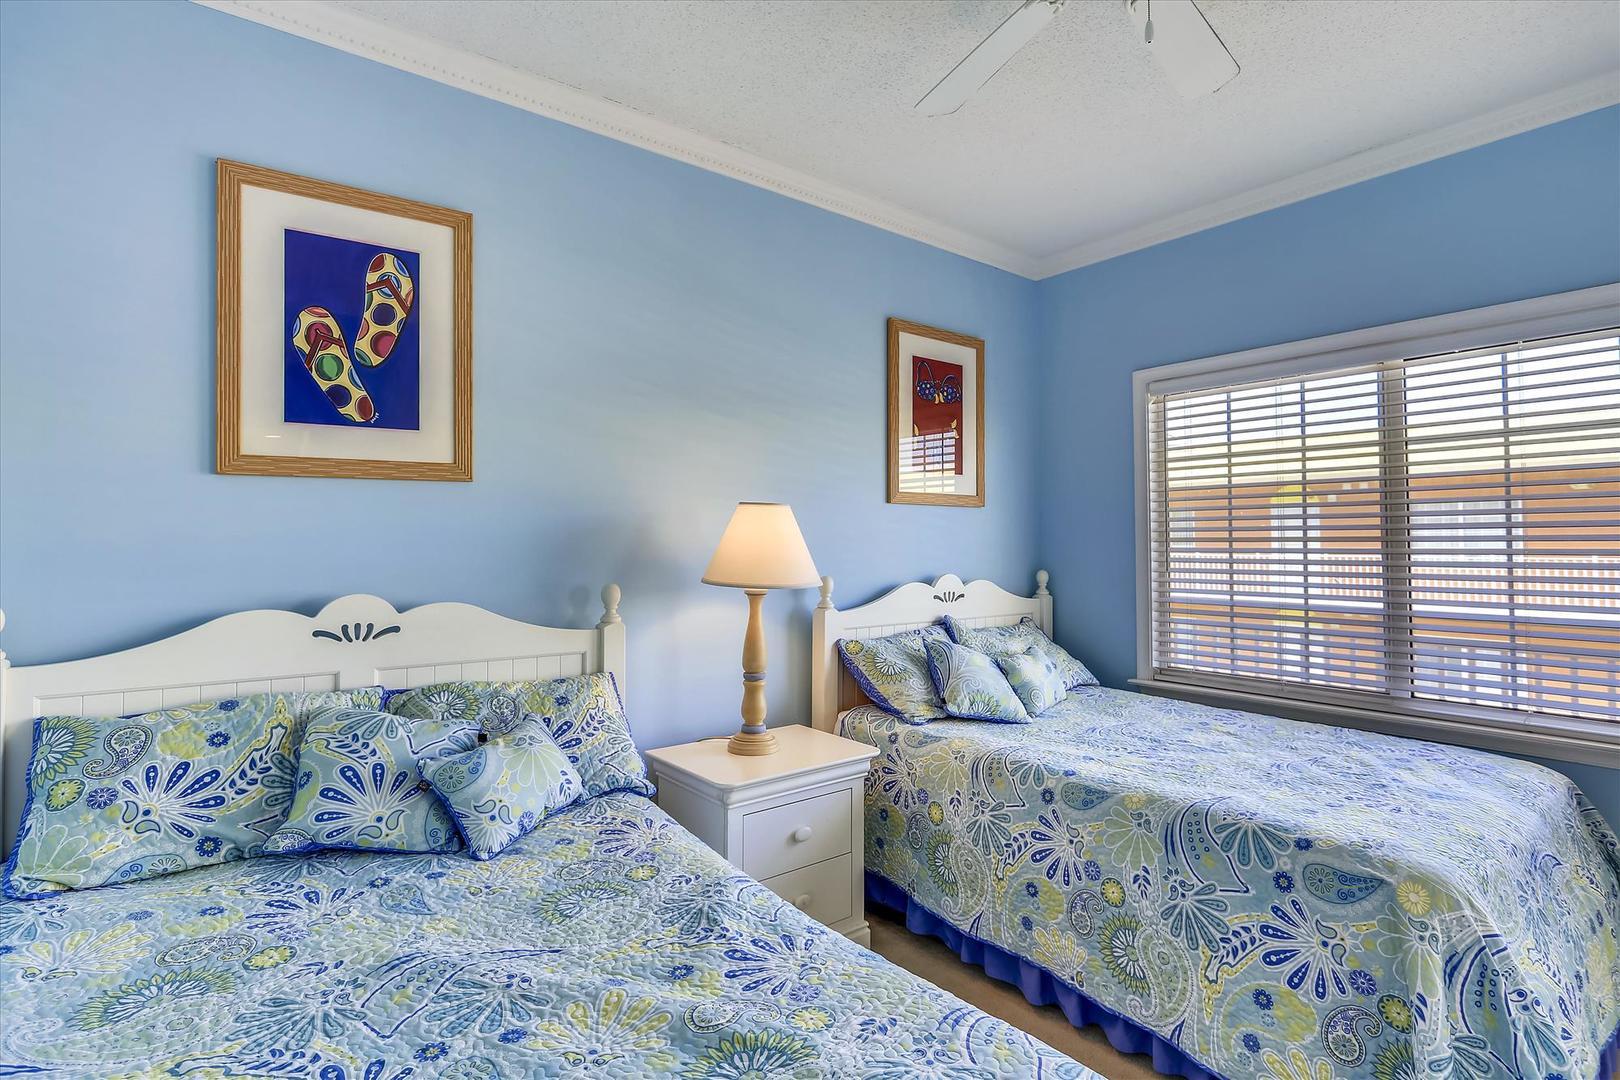 Sunset Bay II 518 - Bedroom 2